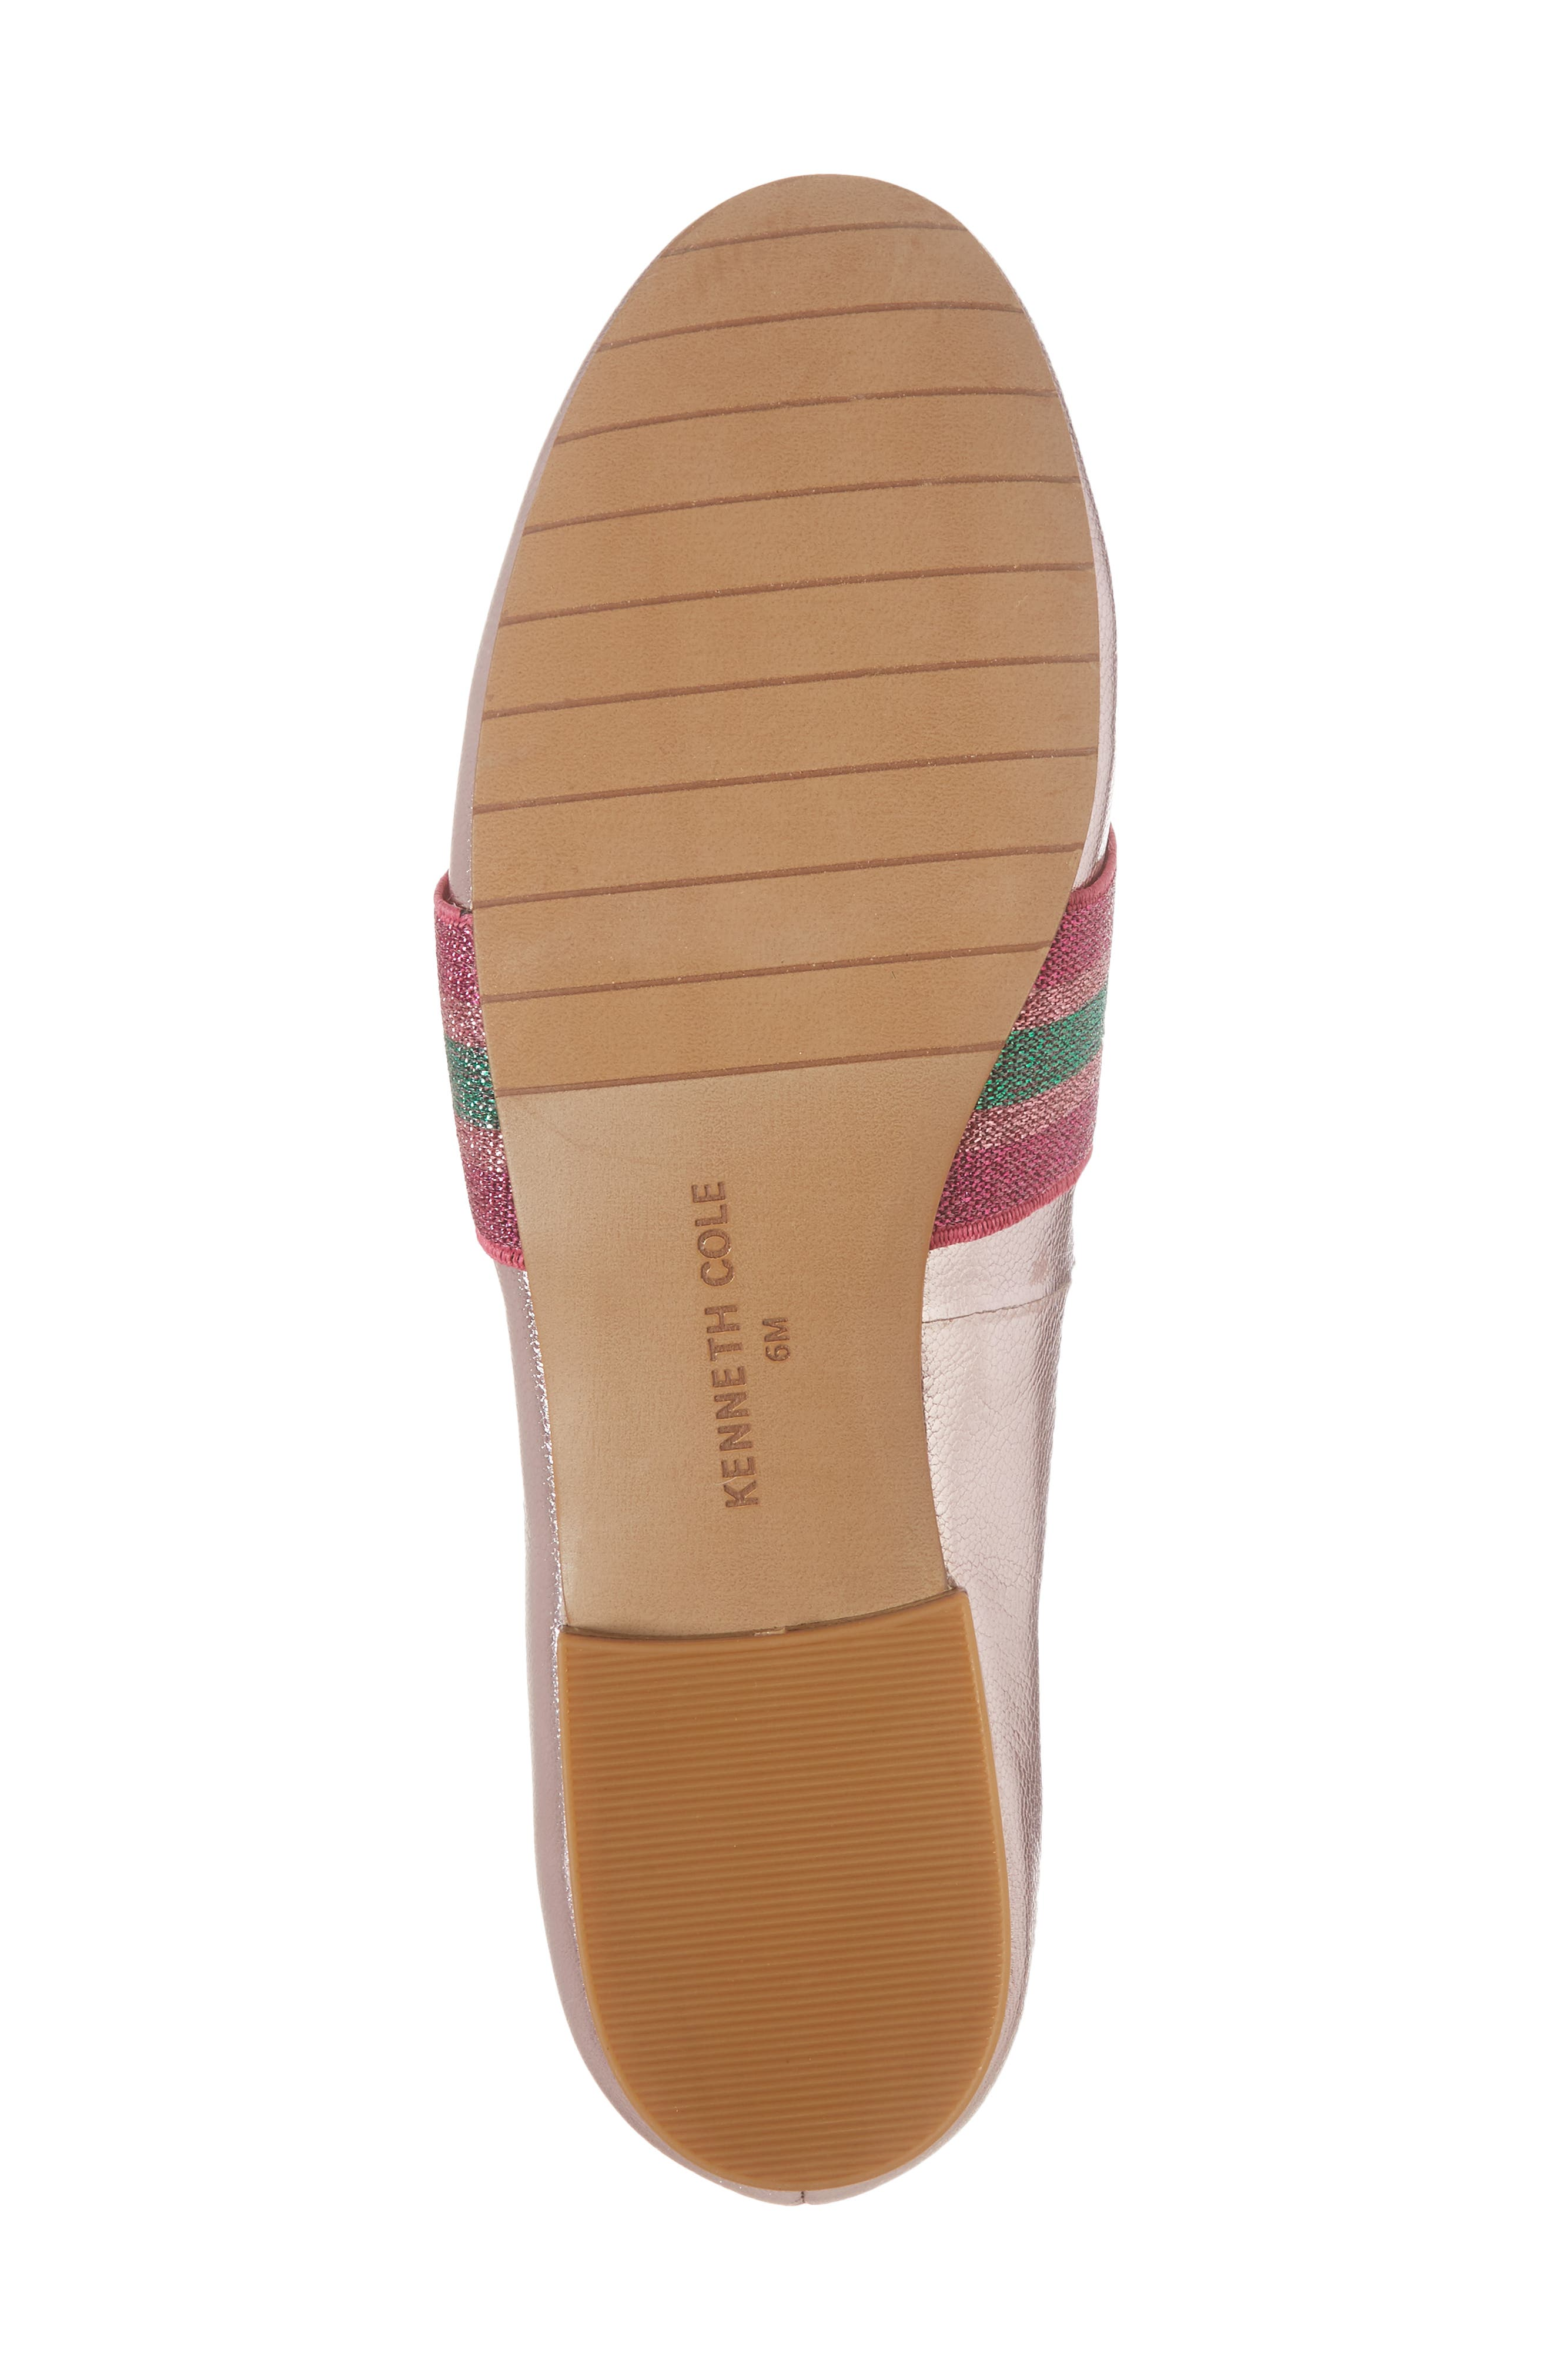 Walden Loafer,                             Alternate thumbnail 6, color,                             Pink Metallic Leather